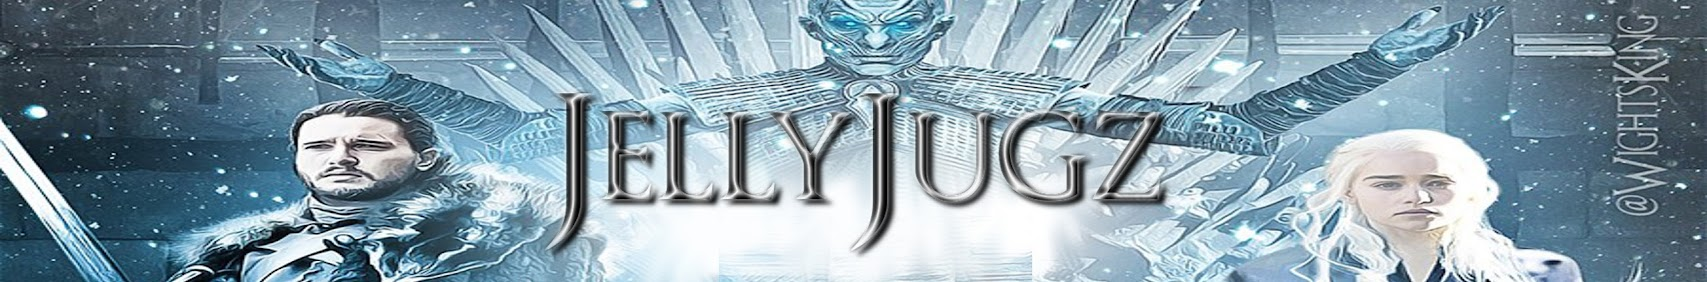 JellyJugz